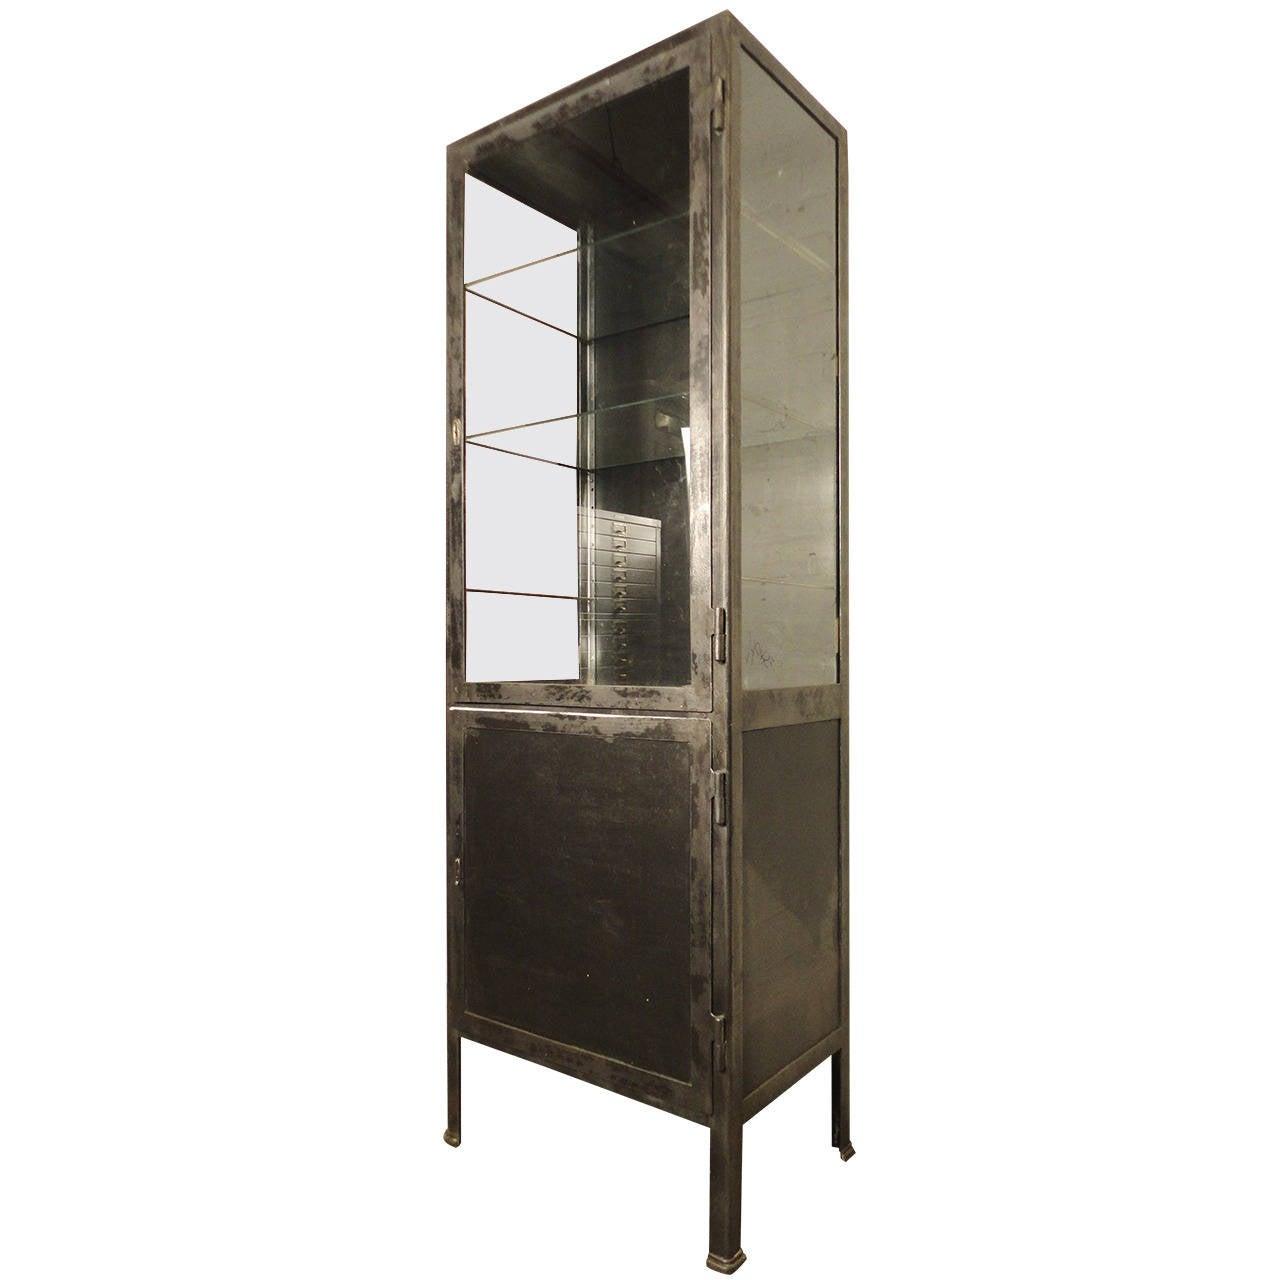 Tall Industrial Metal Display Cabinet at 1stdibs